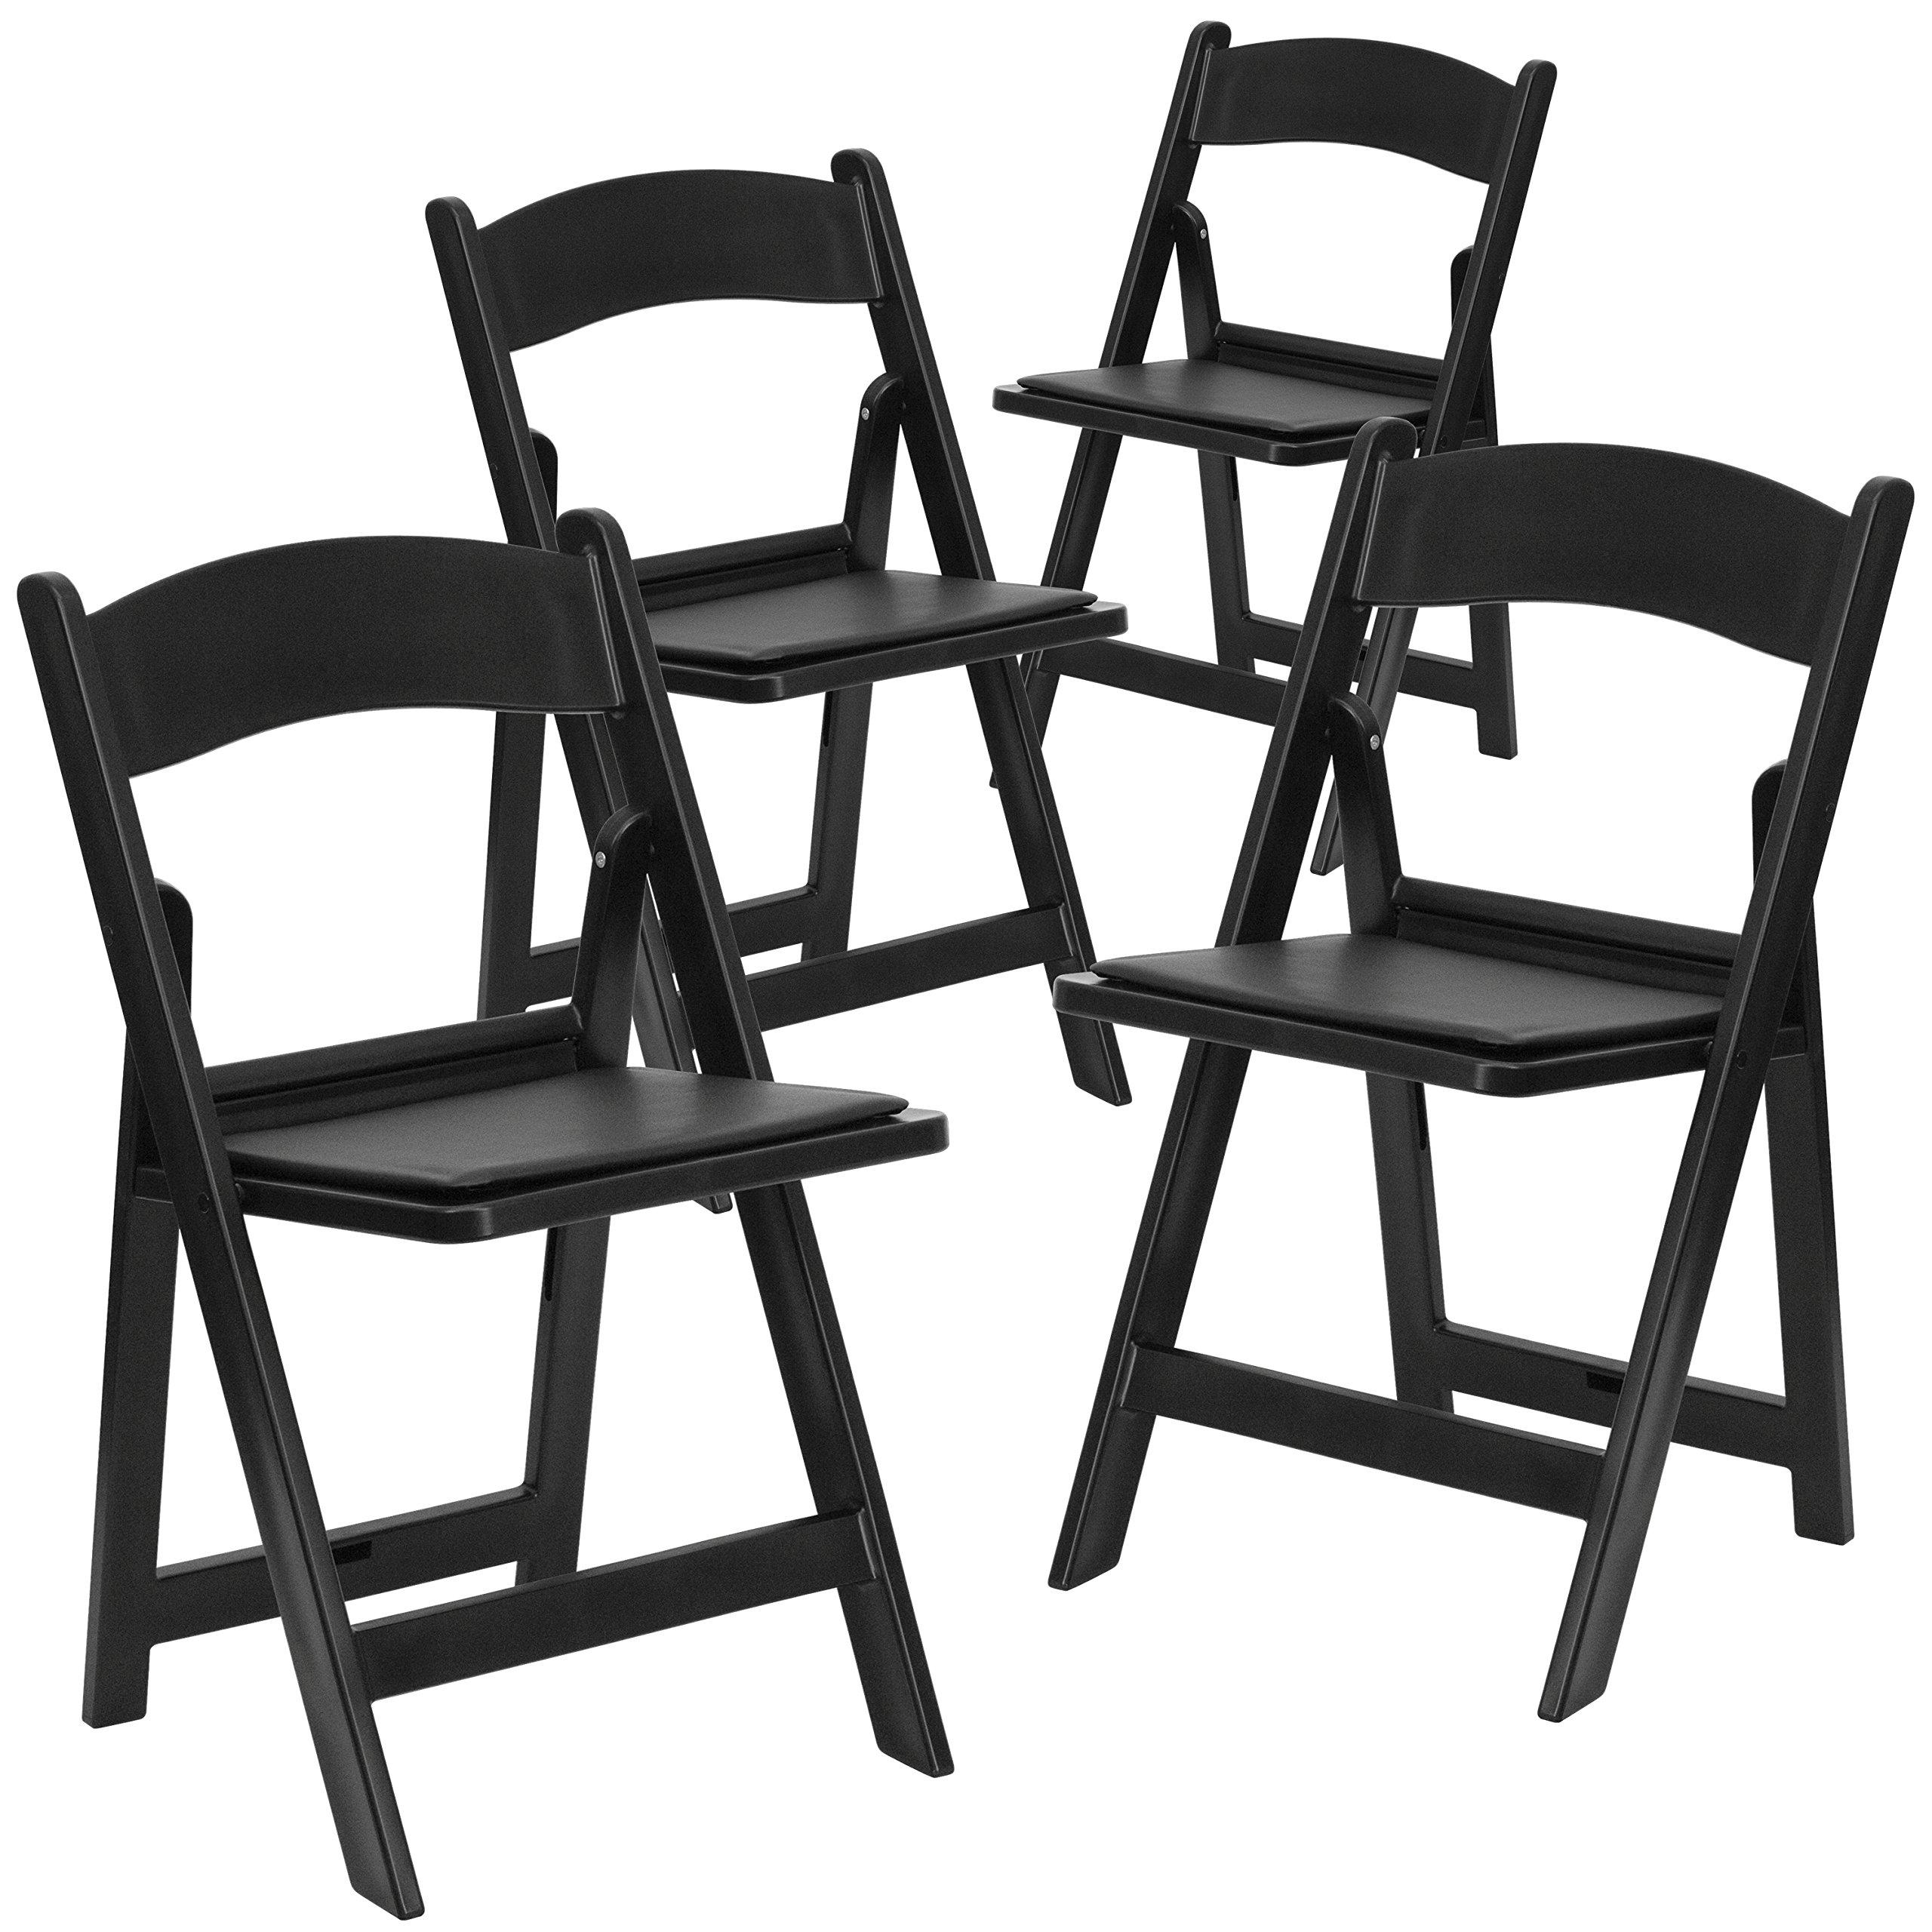 Flash Furniture 4 Pk. HERCULES Series 1000 lb. Capacity Black Resin Folding Chair with Black Vinyl Padded Seat